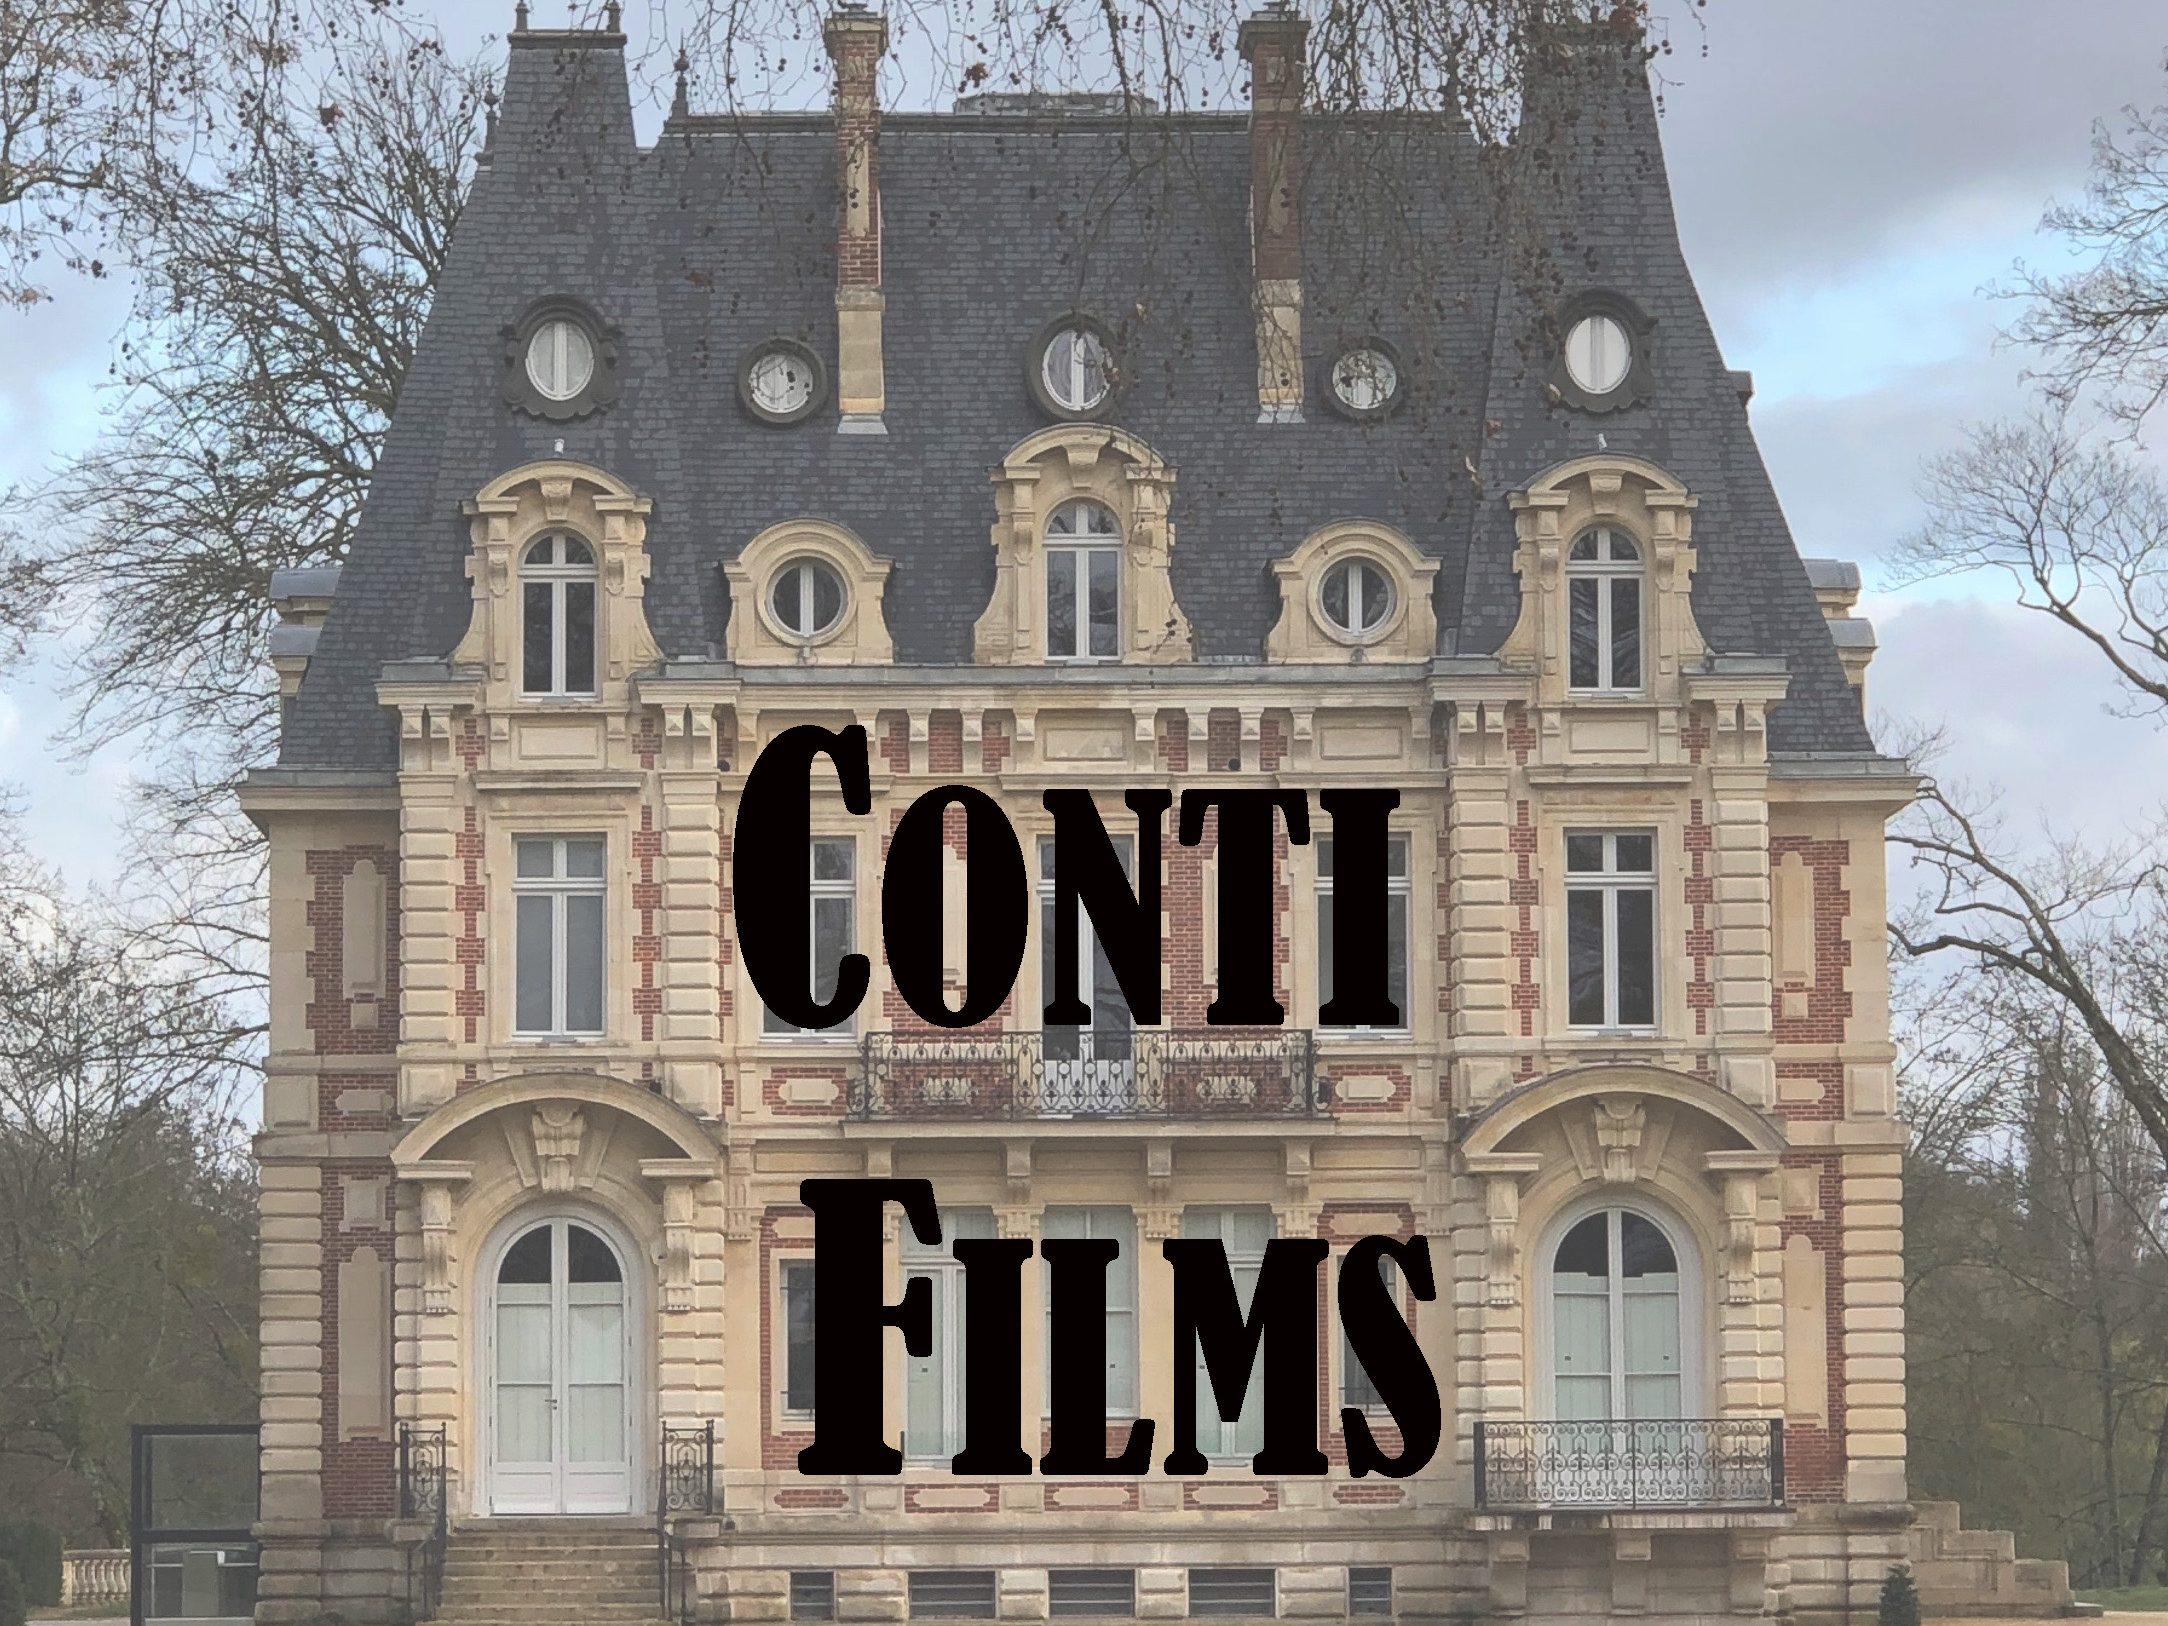 Conti Films